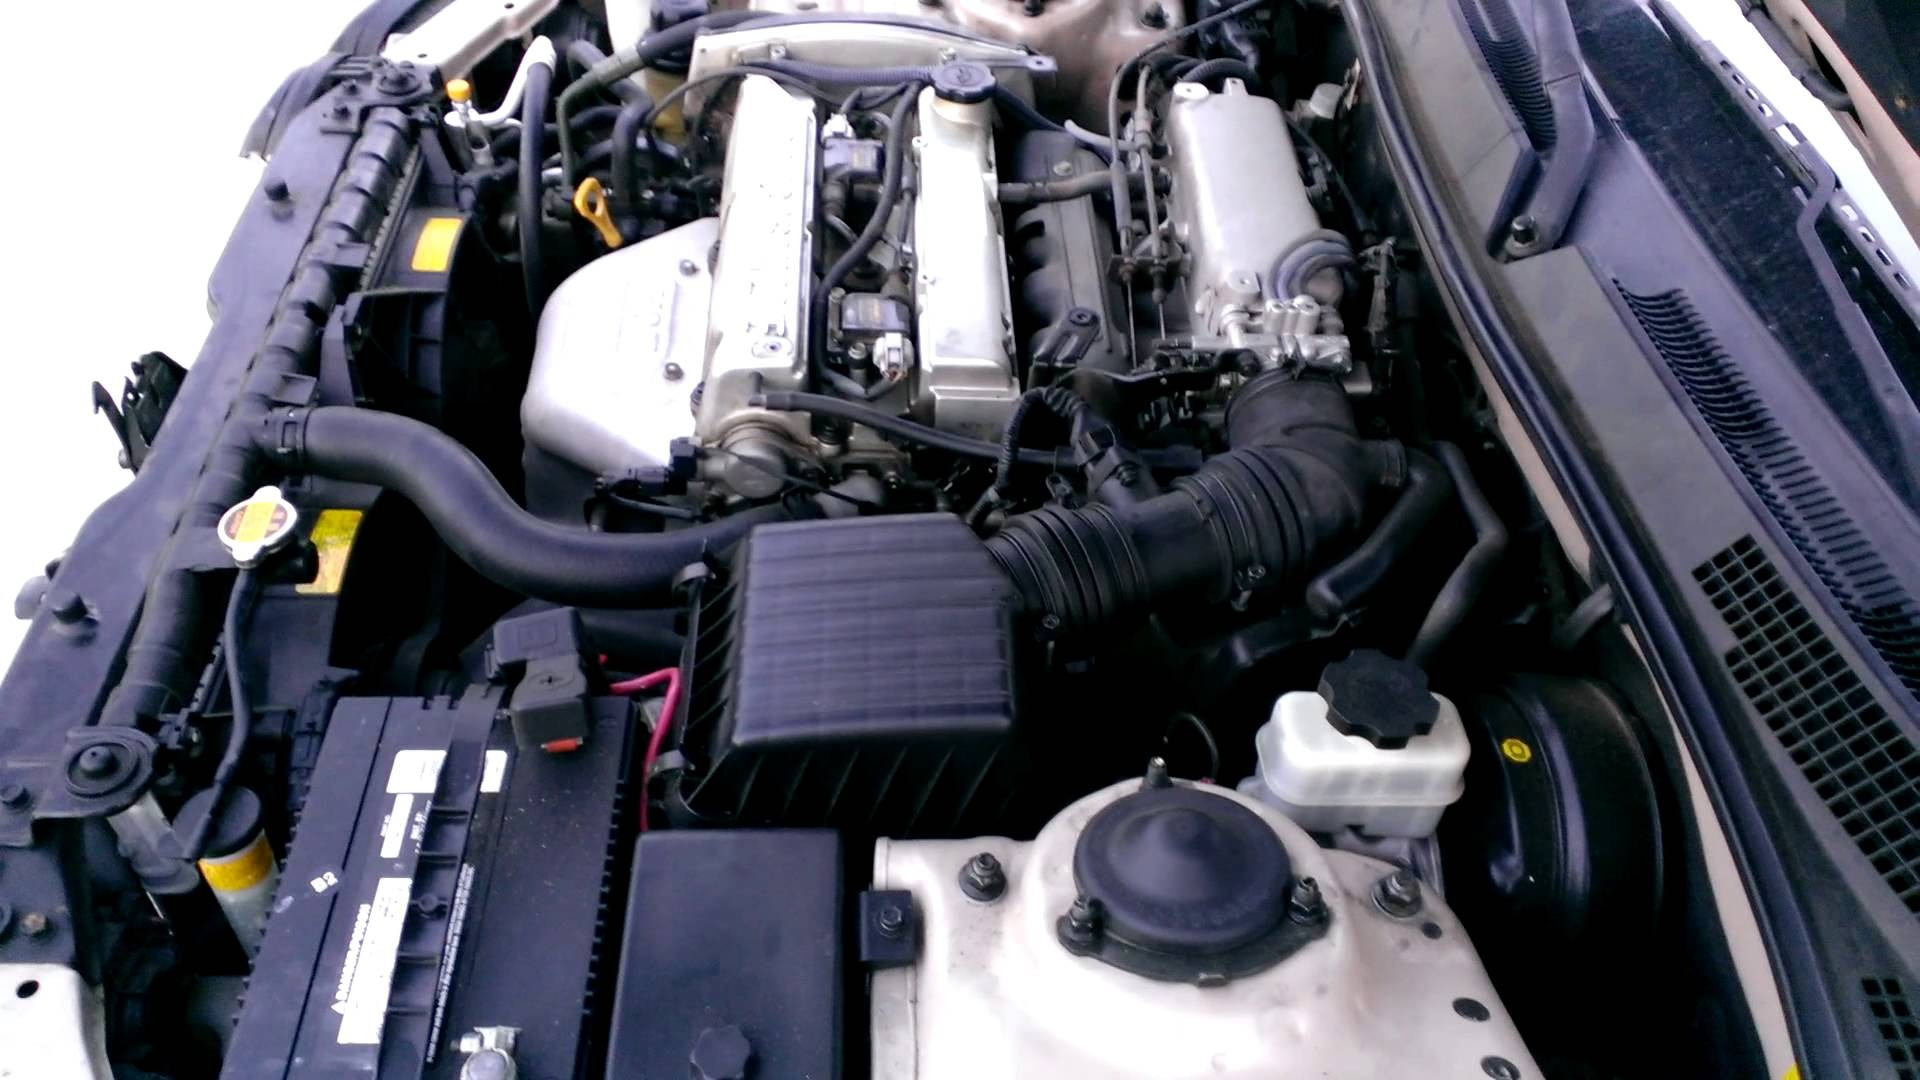 2002 Kia Spectra Engine Diagram Noisy Engine 2006 Kia Optima Lx 2 4l 4 Cylinder What S Does This Of 2002 Kia Spectra Engine Diagram